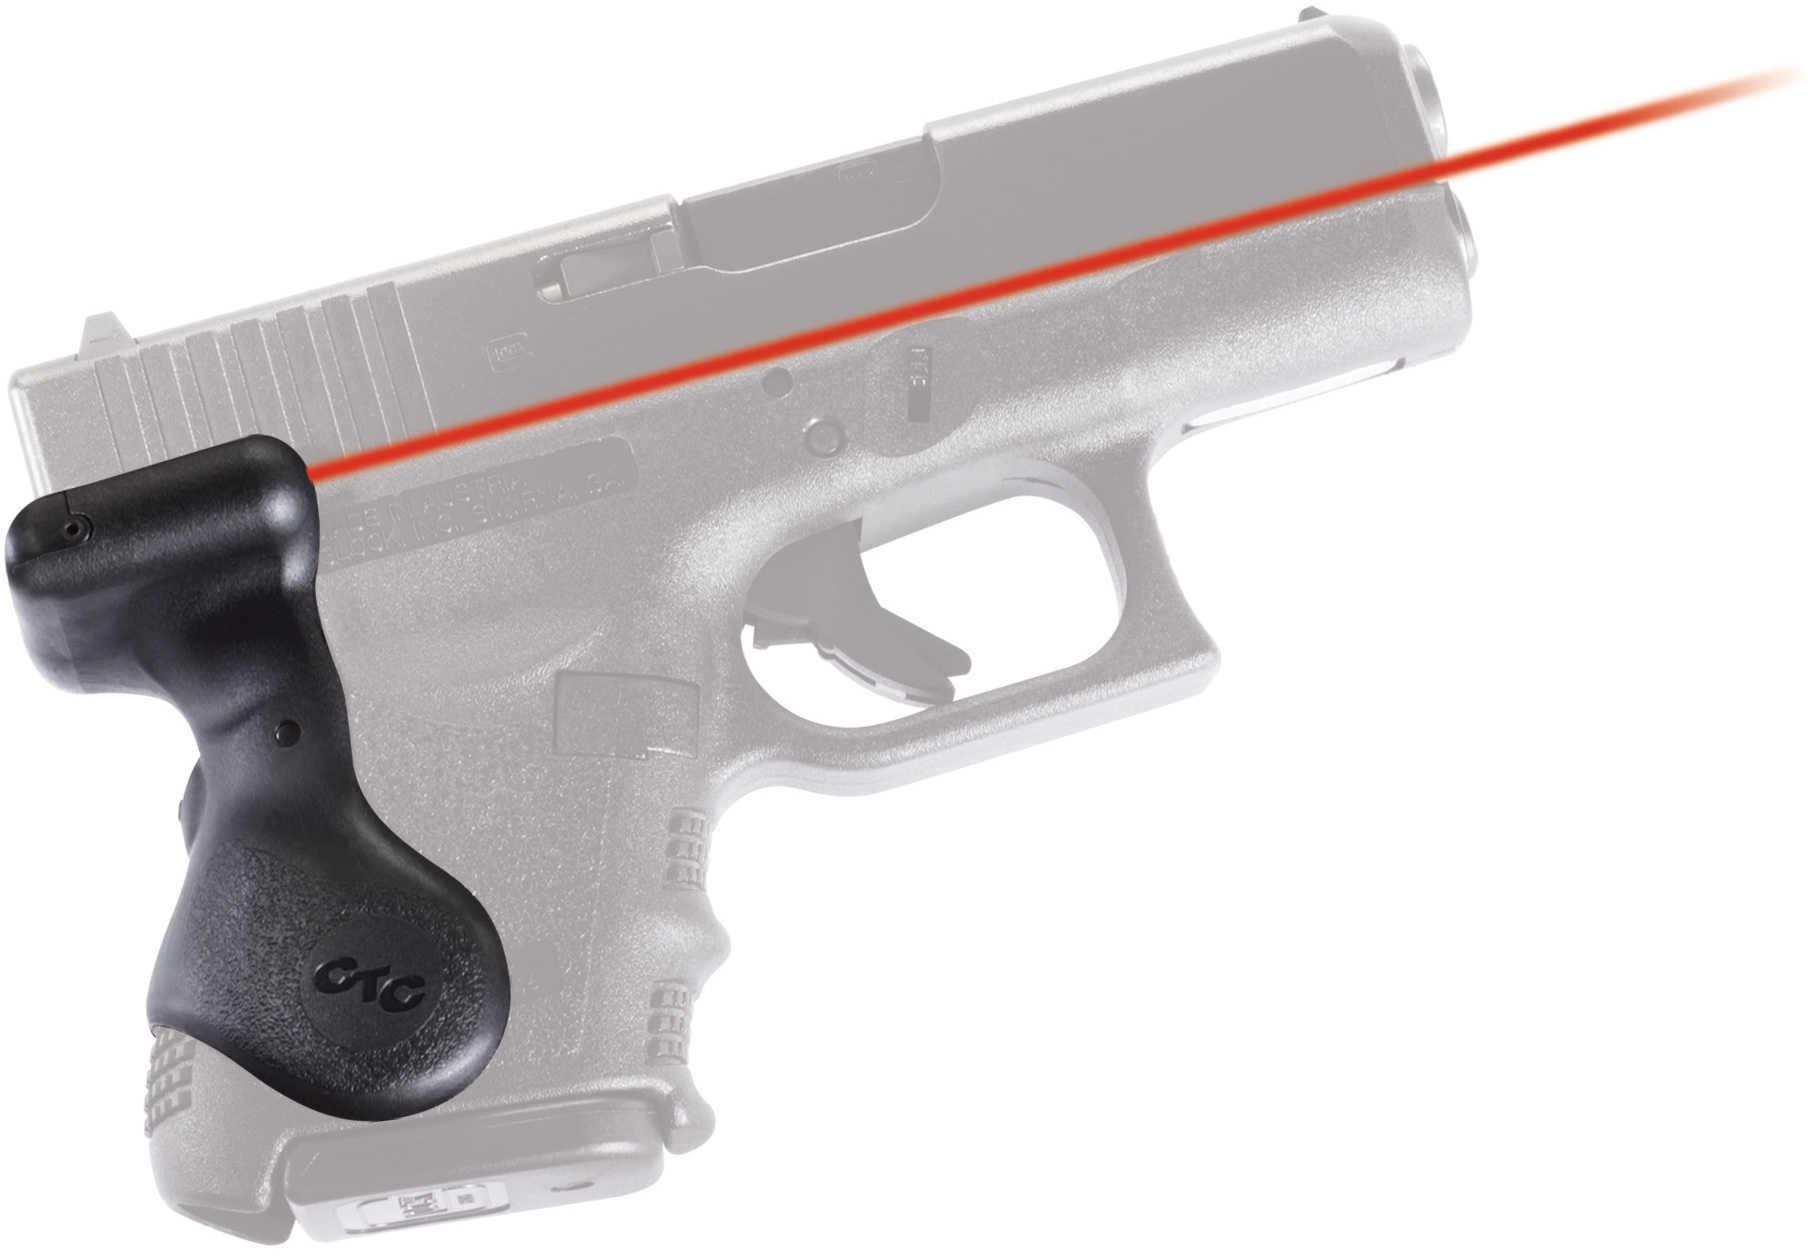 Crimson Trace Corporation Hi-Brite LaserGrip Fits Glock 26 27 28 33 User Installed LG-626